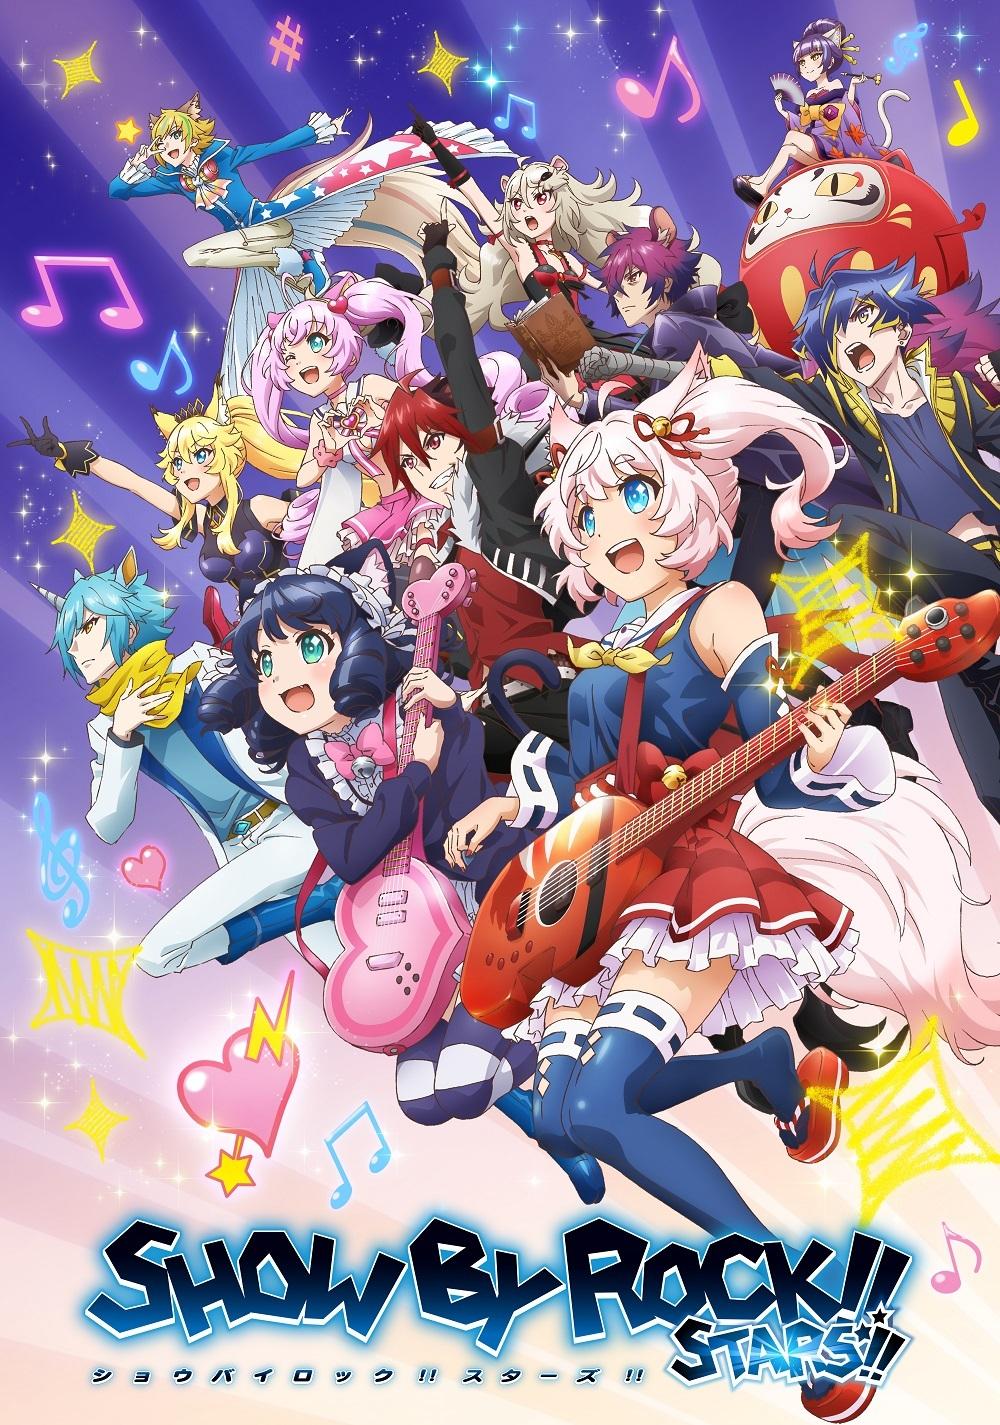 TVアニメ『SHOW BY ROCK!! STARS!!』キービジュアル (C)2012,2020 SANRIO CO.,LTD. SHOWBYROCK!!製作委員会M